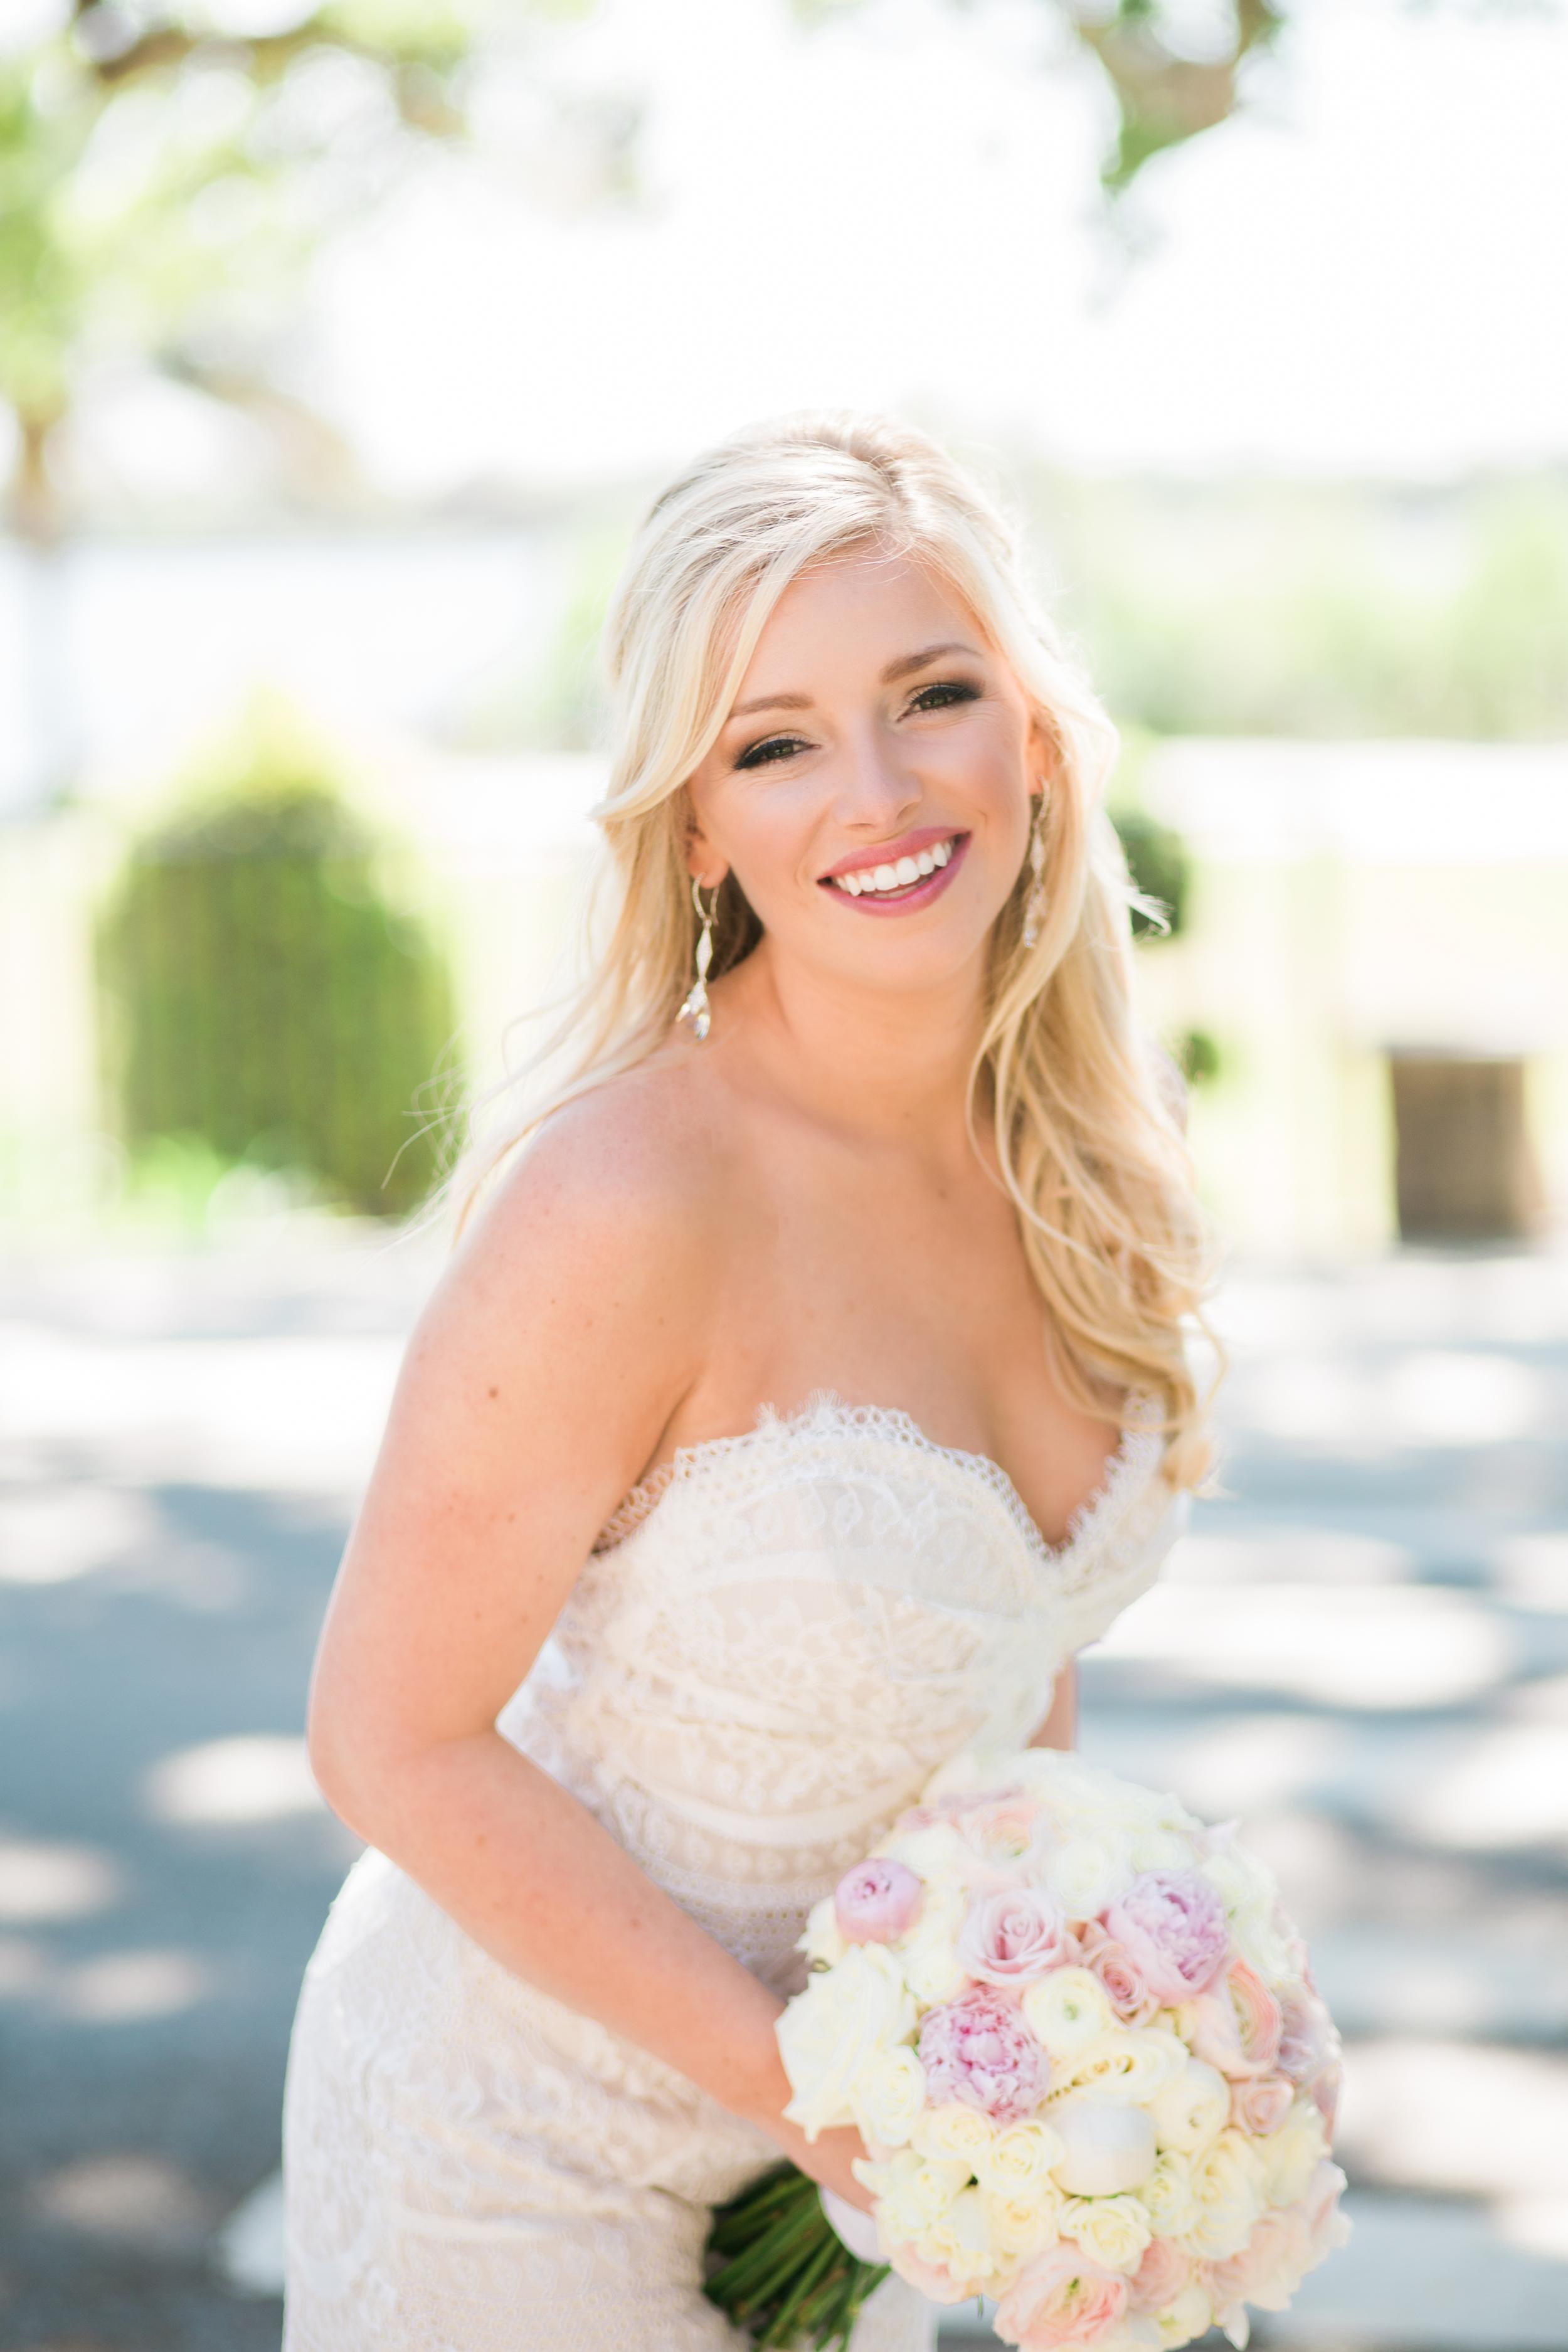 kristenweaver.com | Kristen Weaver Photography | Ormond Beach Florida Weddings | Orlando Wedding Photographer